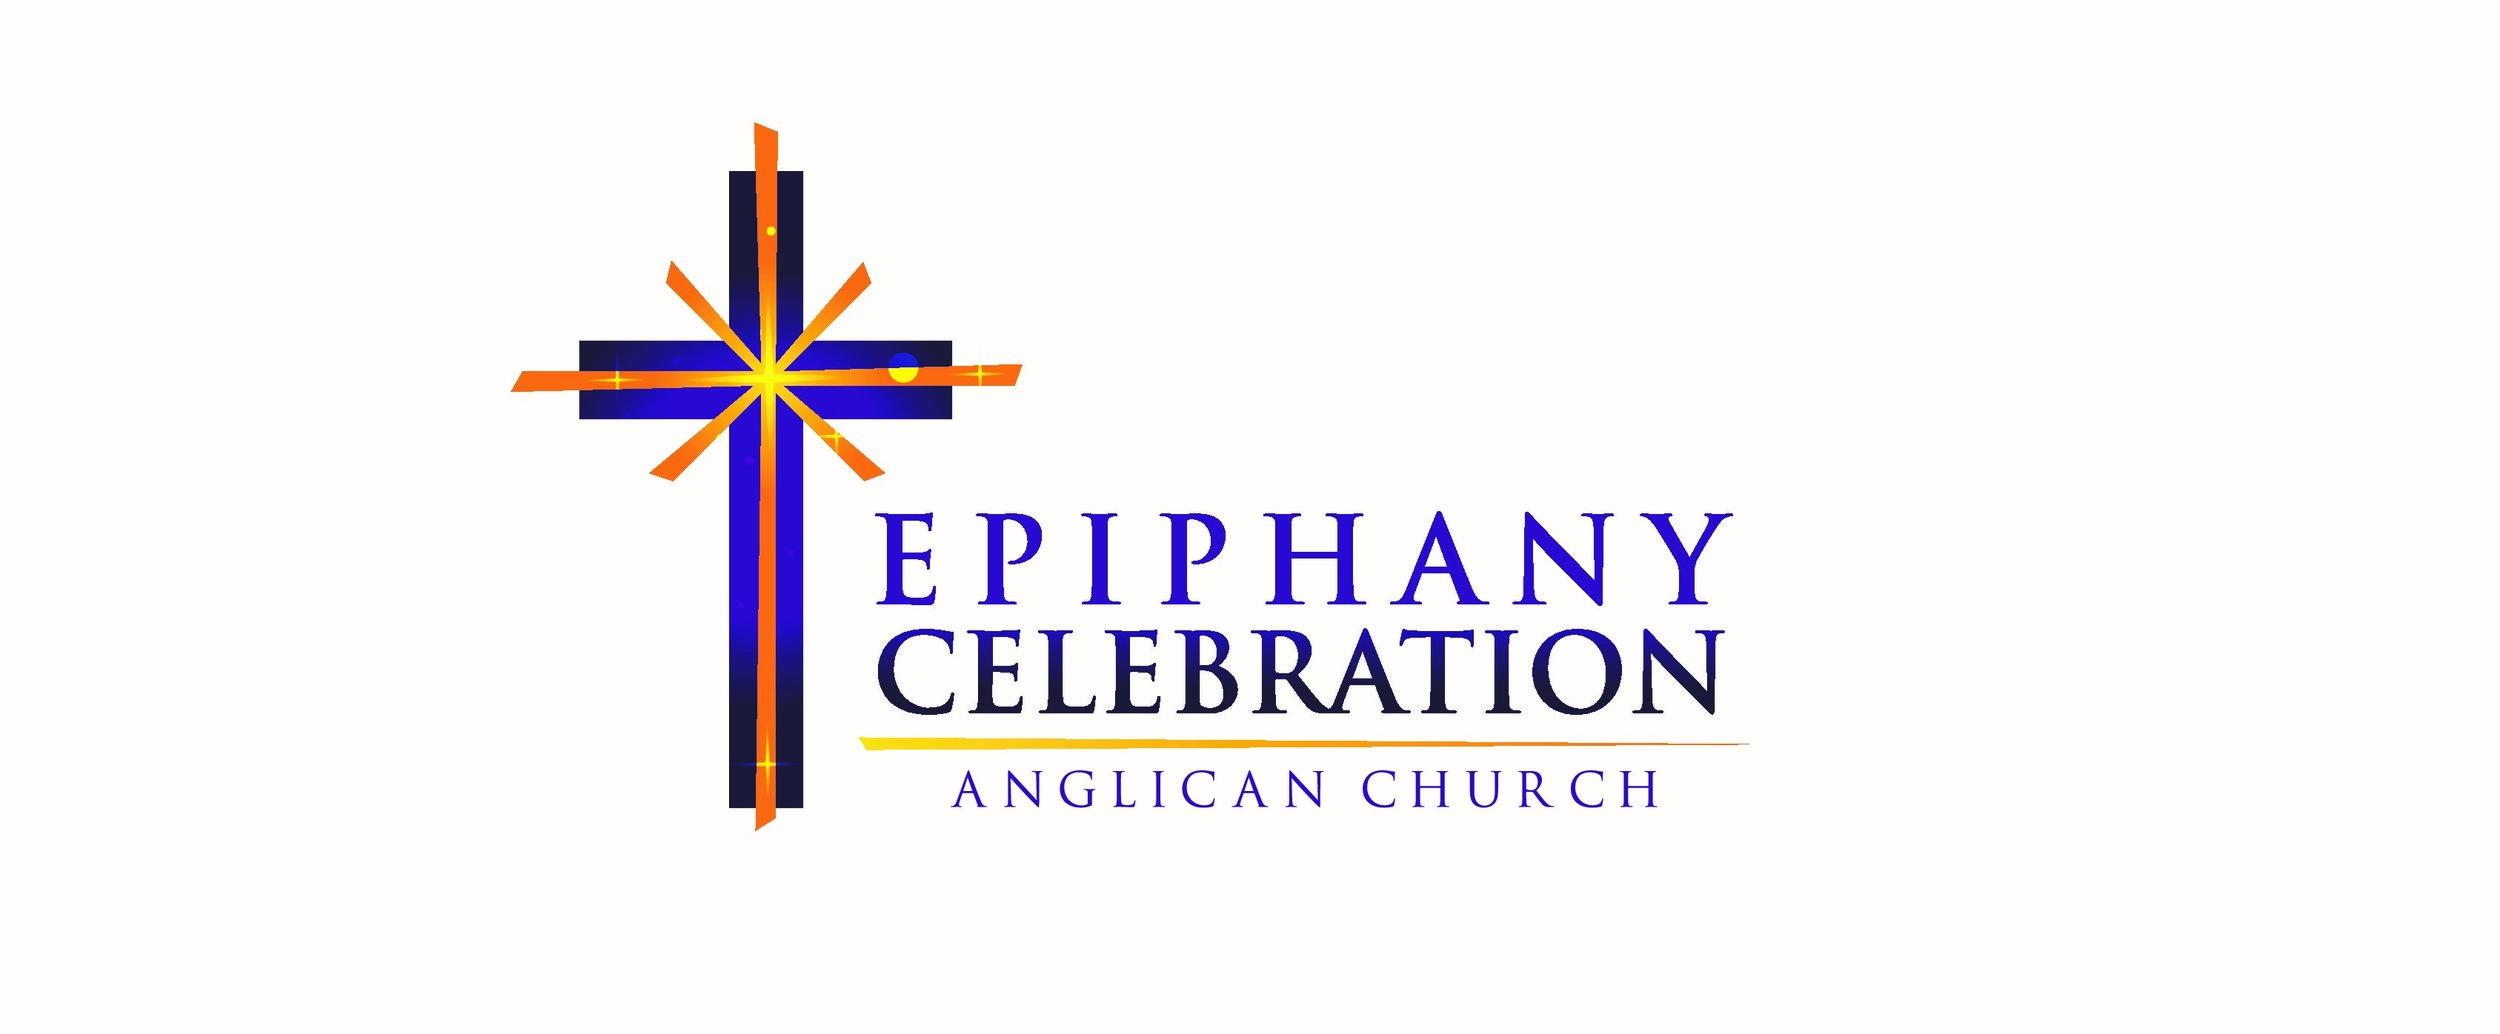 Epihpany logo idea_1 (2) (1)-page-0.jpg